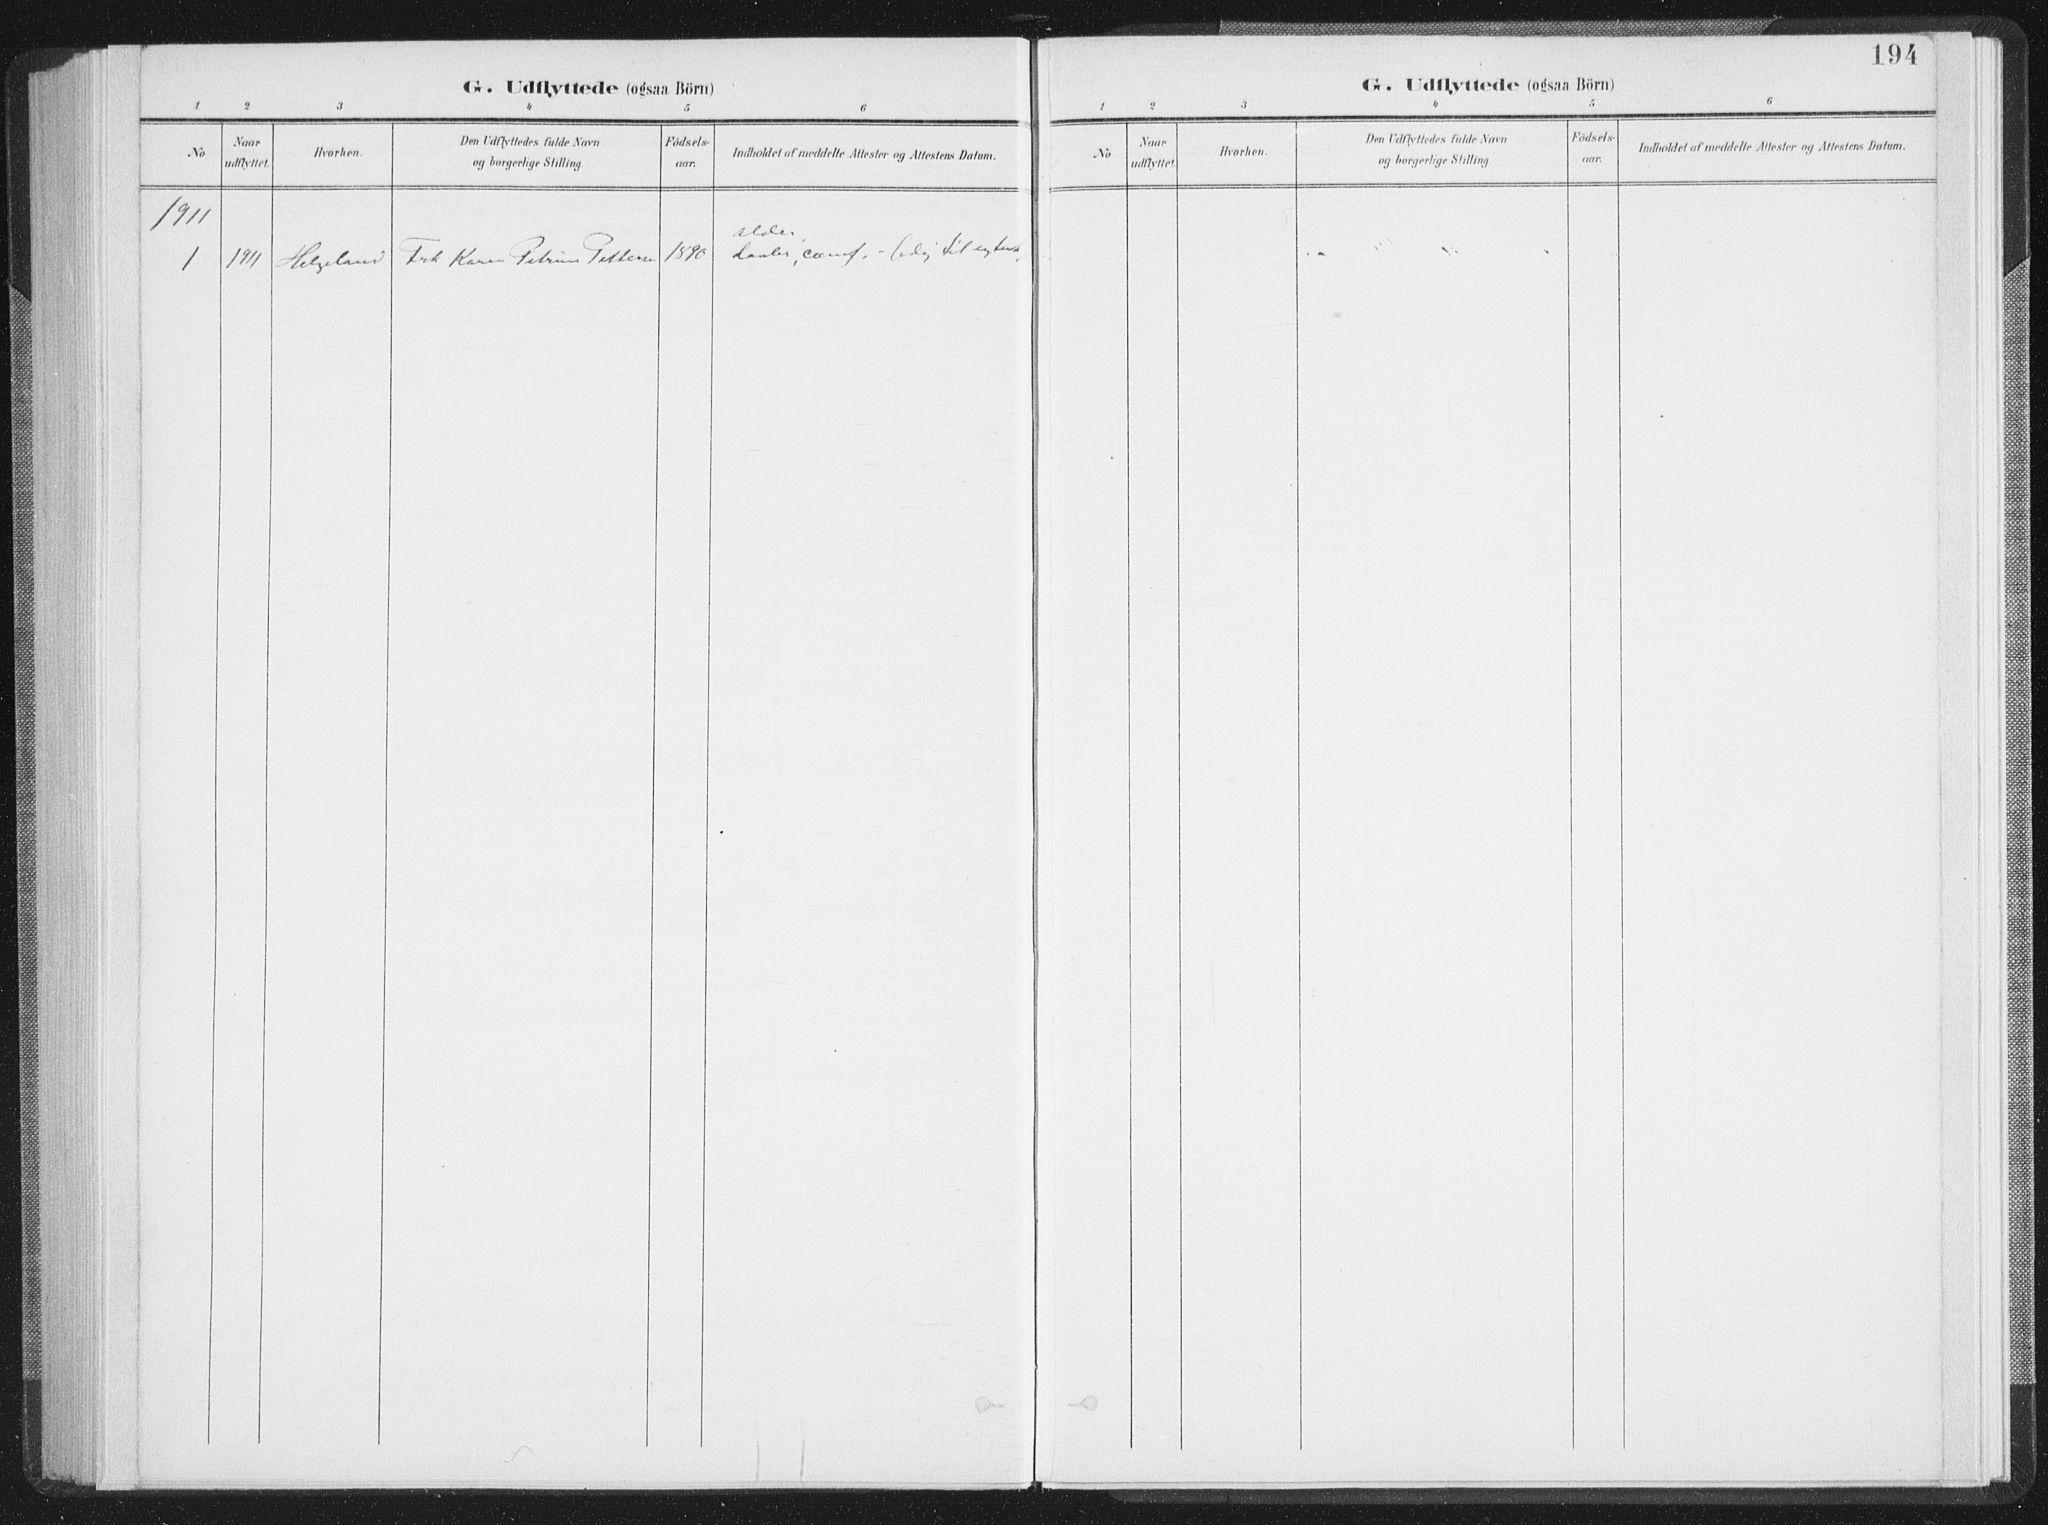 SAT, Ministerialprotokoller, klokkerbøker og fødselsregistre - Nordland, 897/L1400: Ministerialbok nr. 897A07, 1897-1908, s. 194